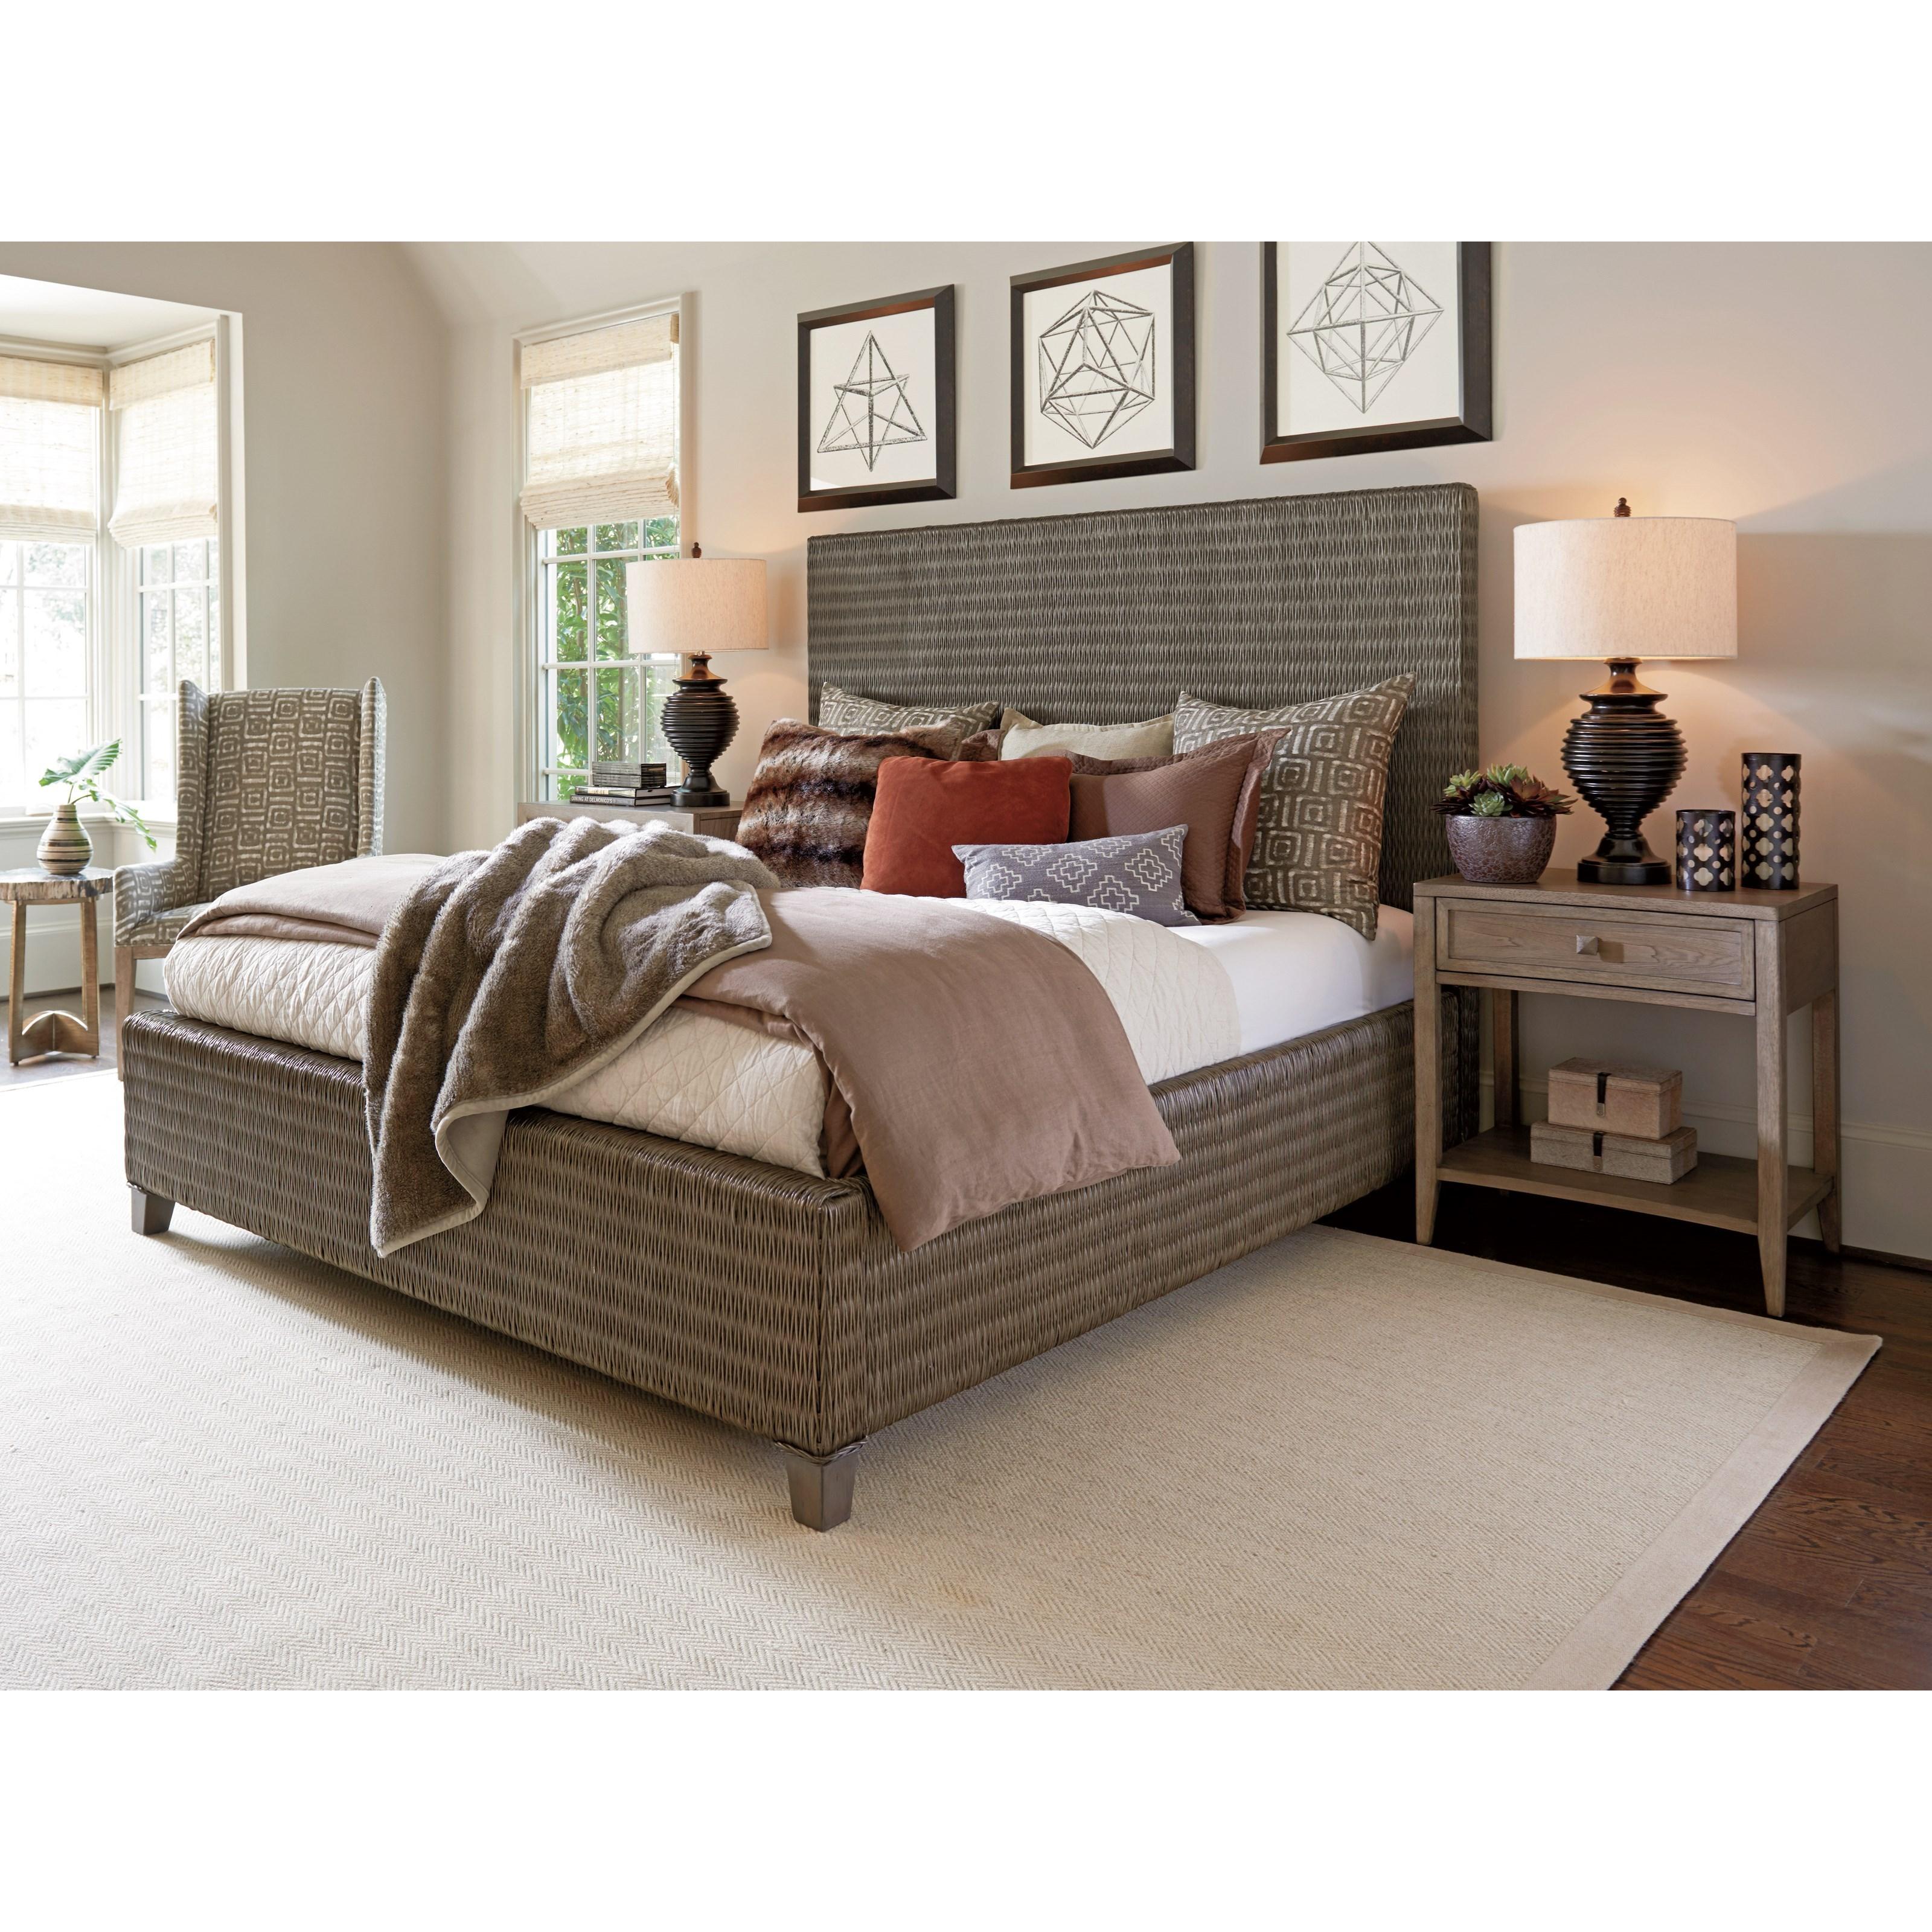 tommy bahama home cypress point queen bedroom group baer 39 s furniture bedroom groups. Black Bedroom Furniture Sets. Home Design Ideas